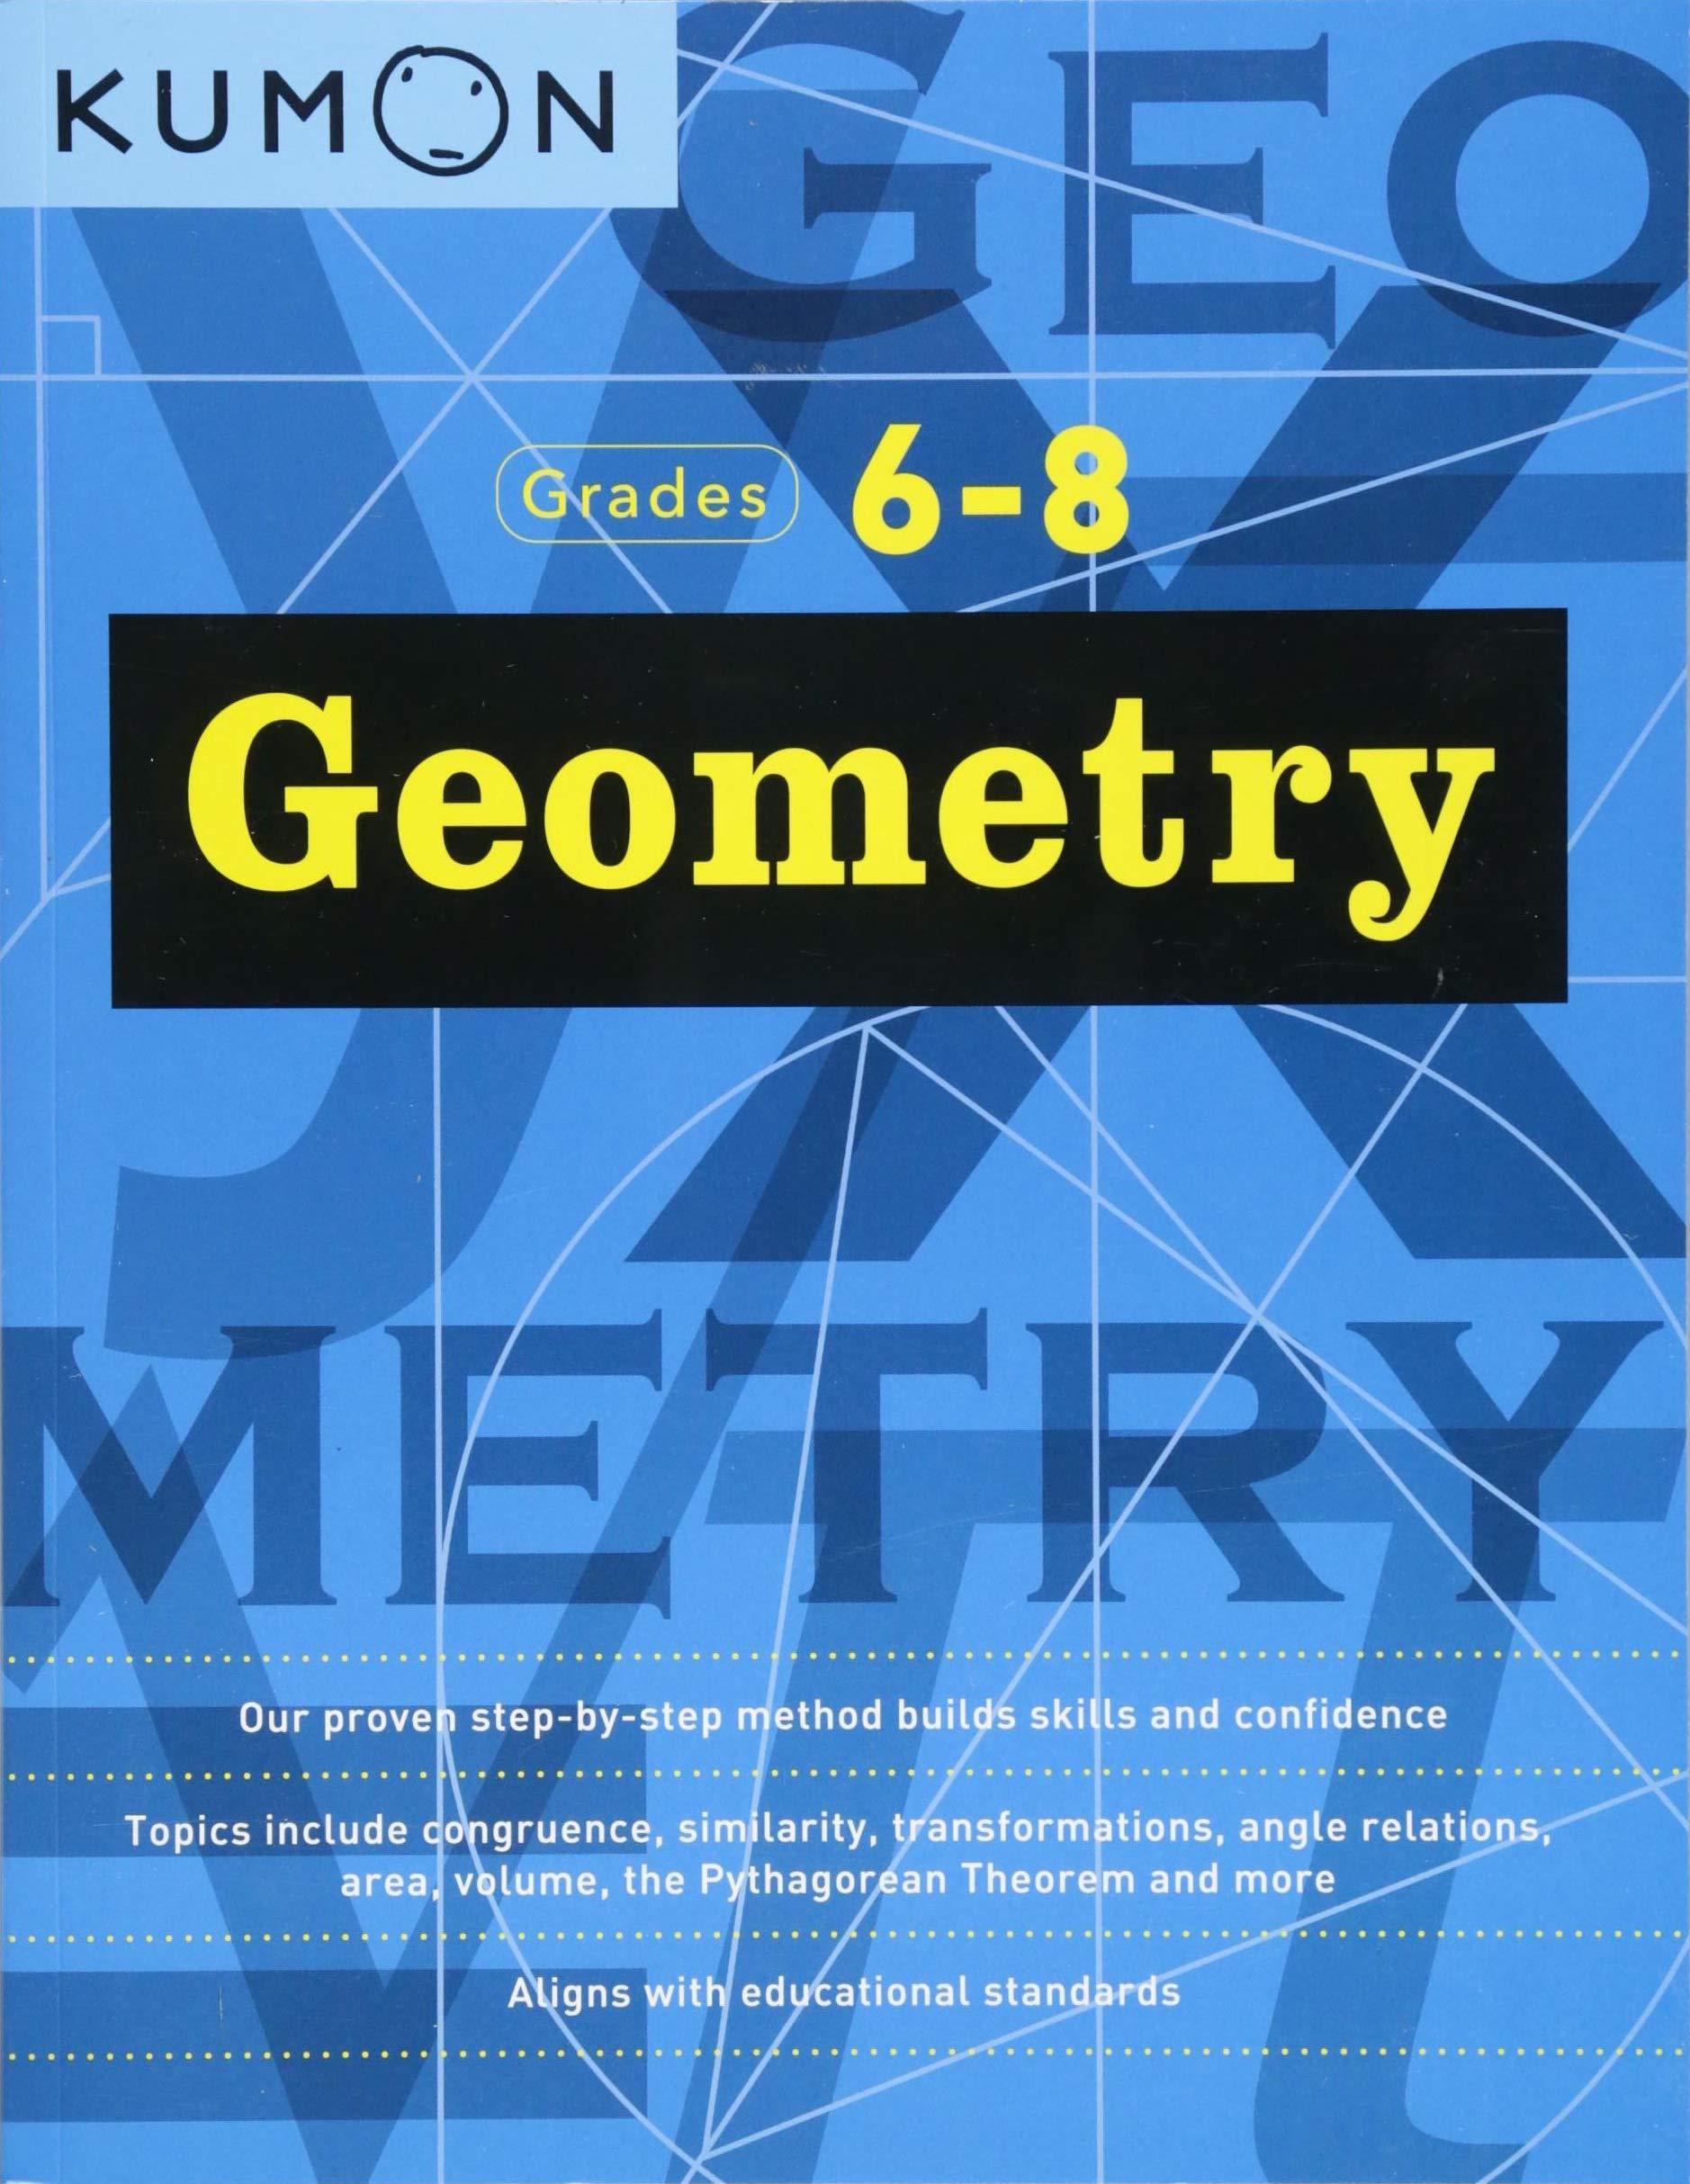 Geometry Grade 6 8 Kumon Kumon Kumon 9781941082713 Books Amazon Ca [ 2427 x 1878 Pixel ]